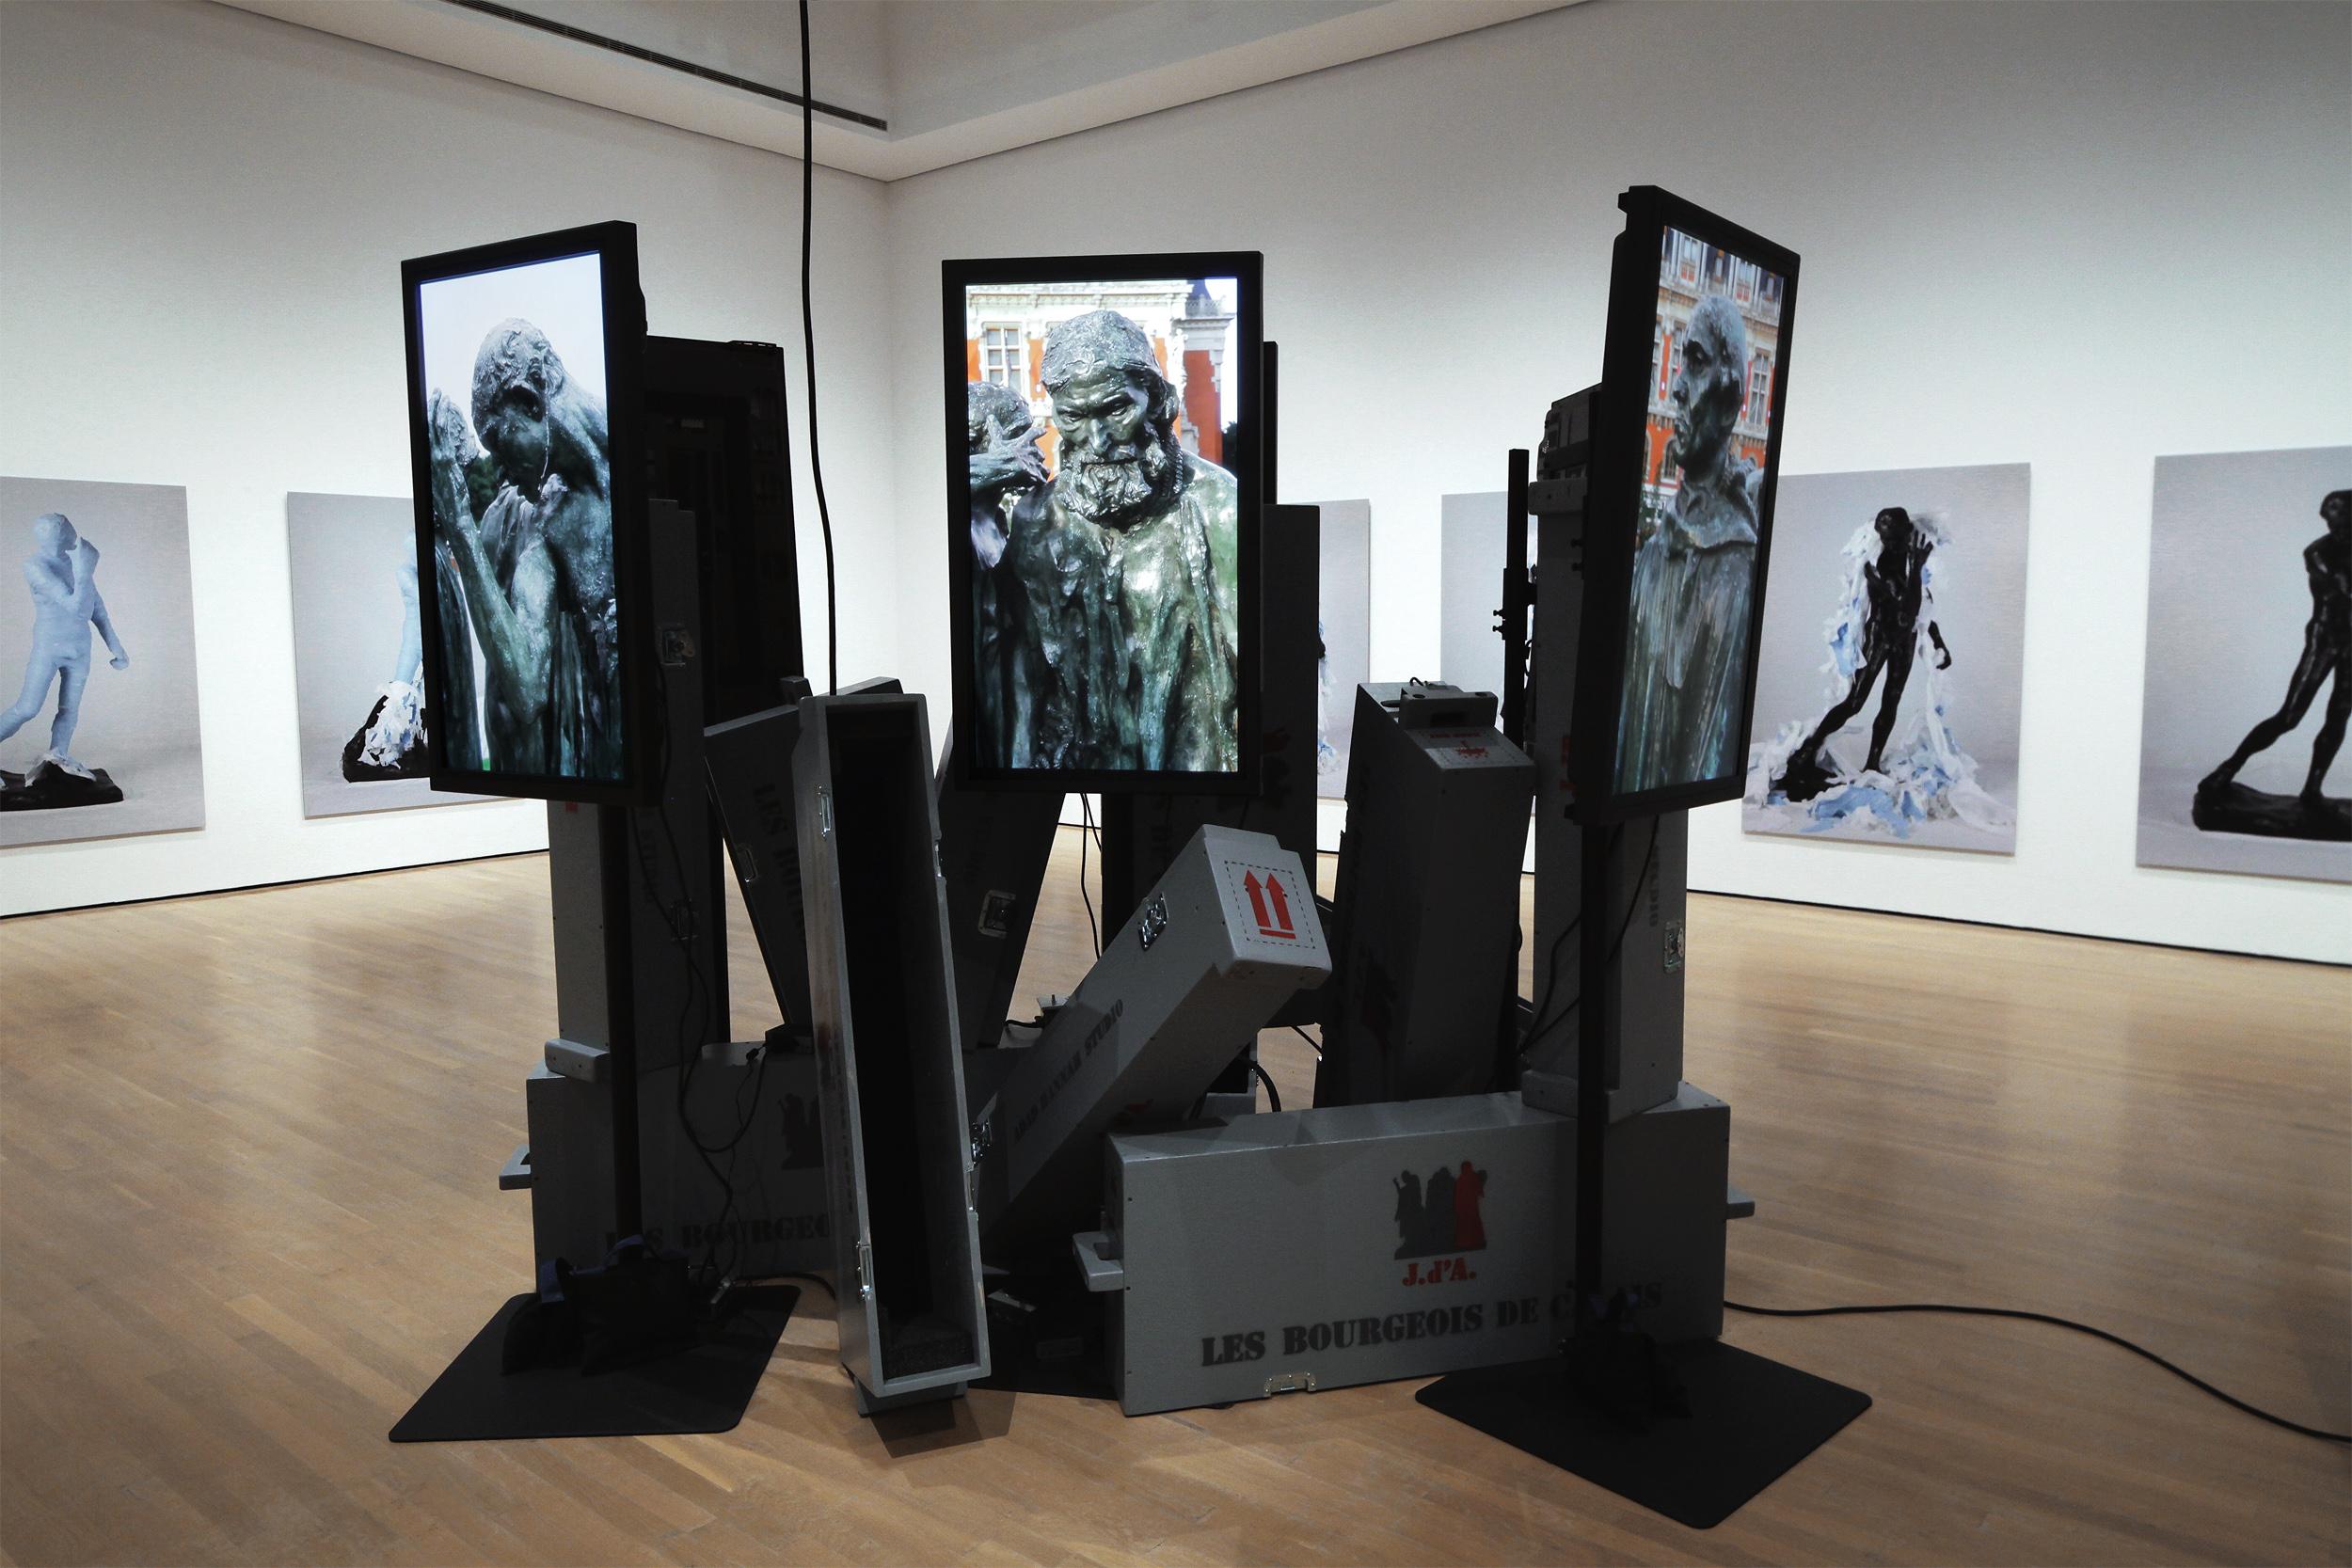 "Les Bourgeois de Calais: Crated and Displaced   2010, 7 HD Videos, 7 42"" plasma screens, 7 crates, other materials Installed at the Musée d'Art Contemporain de Montréal"